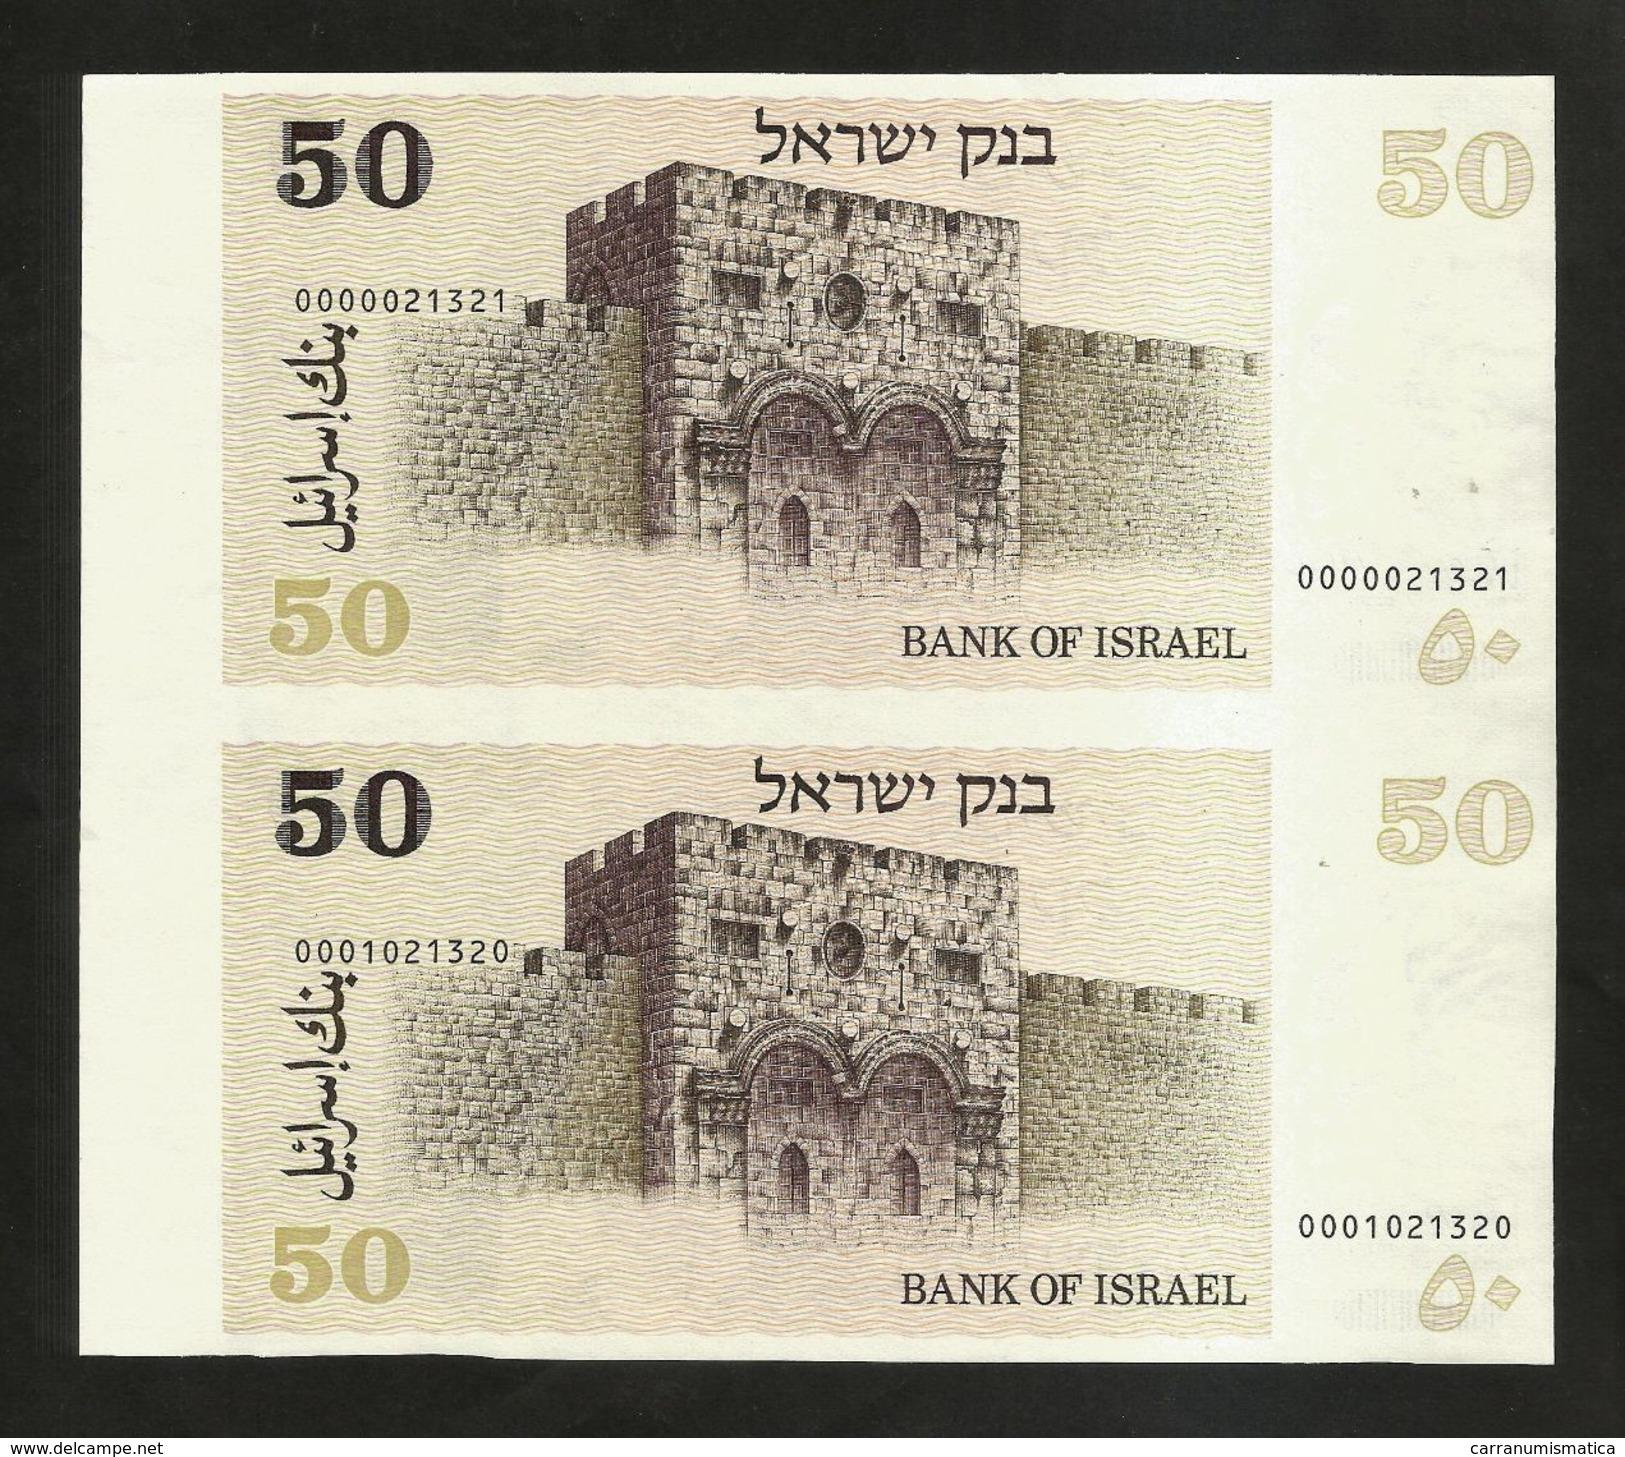 Uncut Banknotes - ISRAEL - BANK Of ISRAEL - 50 Sheqel (1978) - Israel